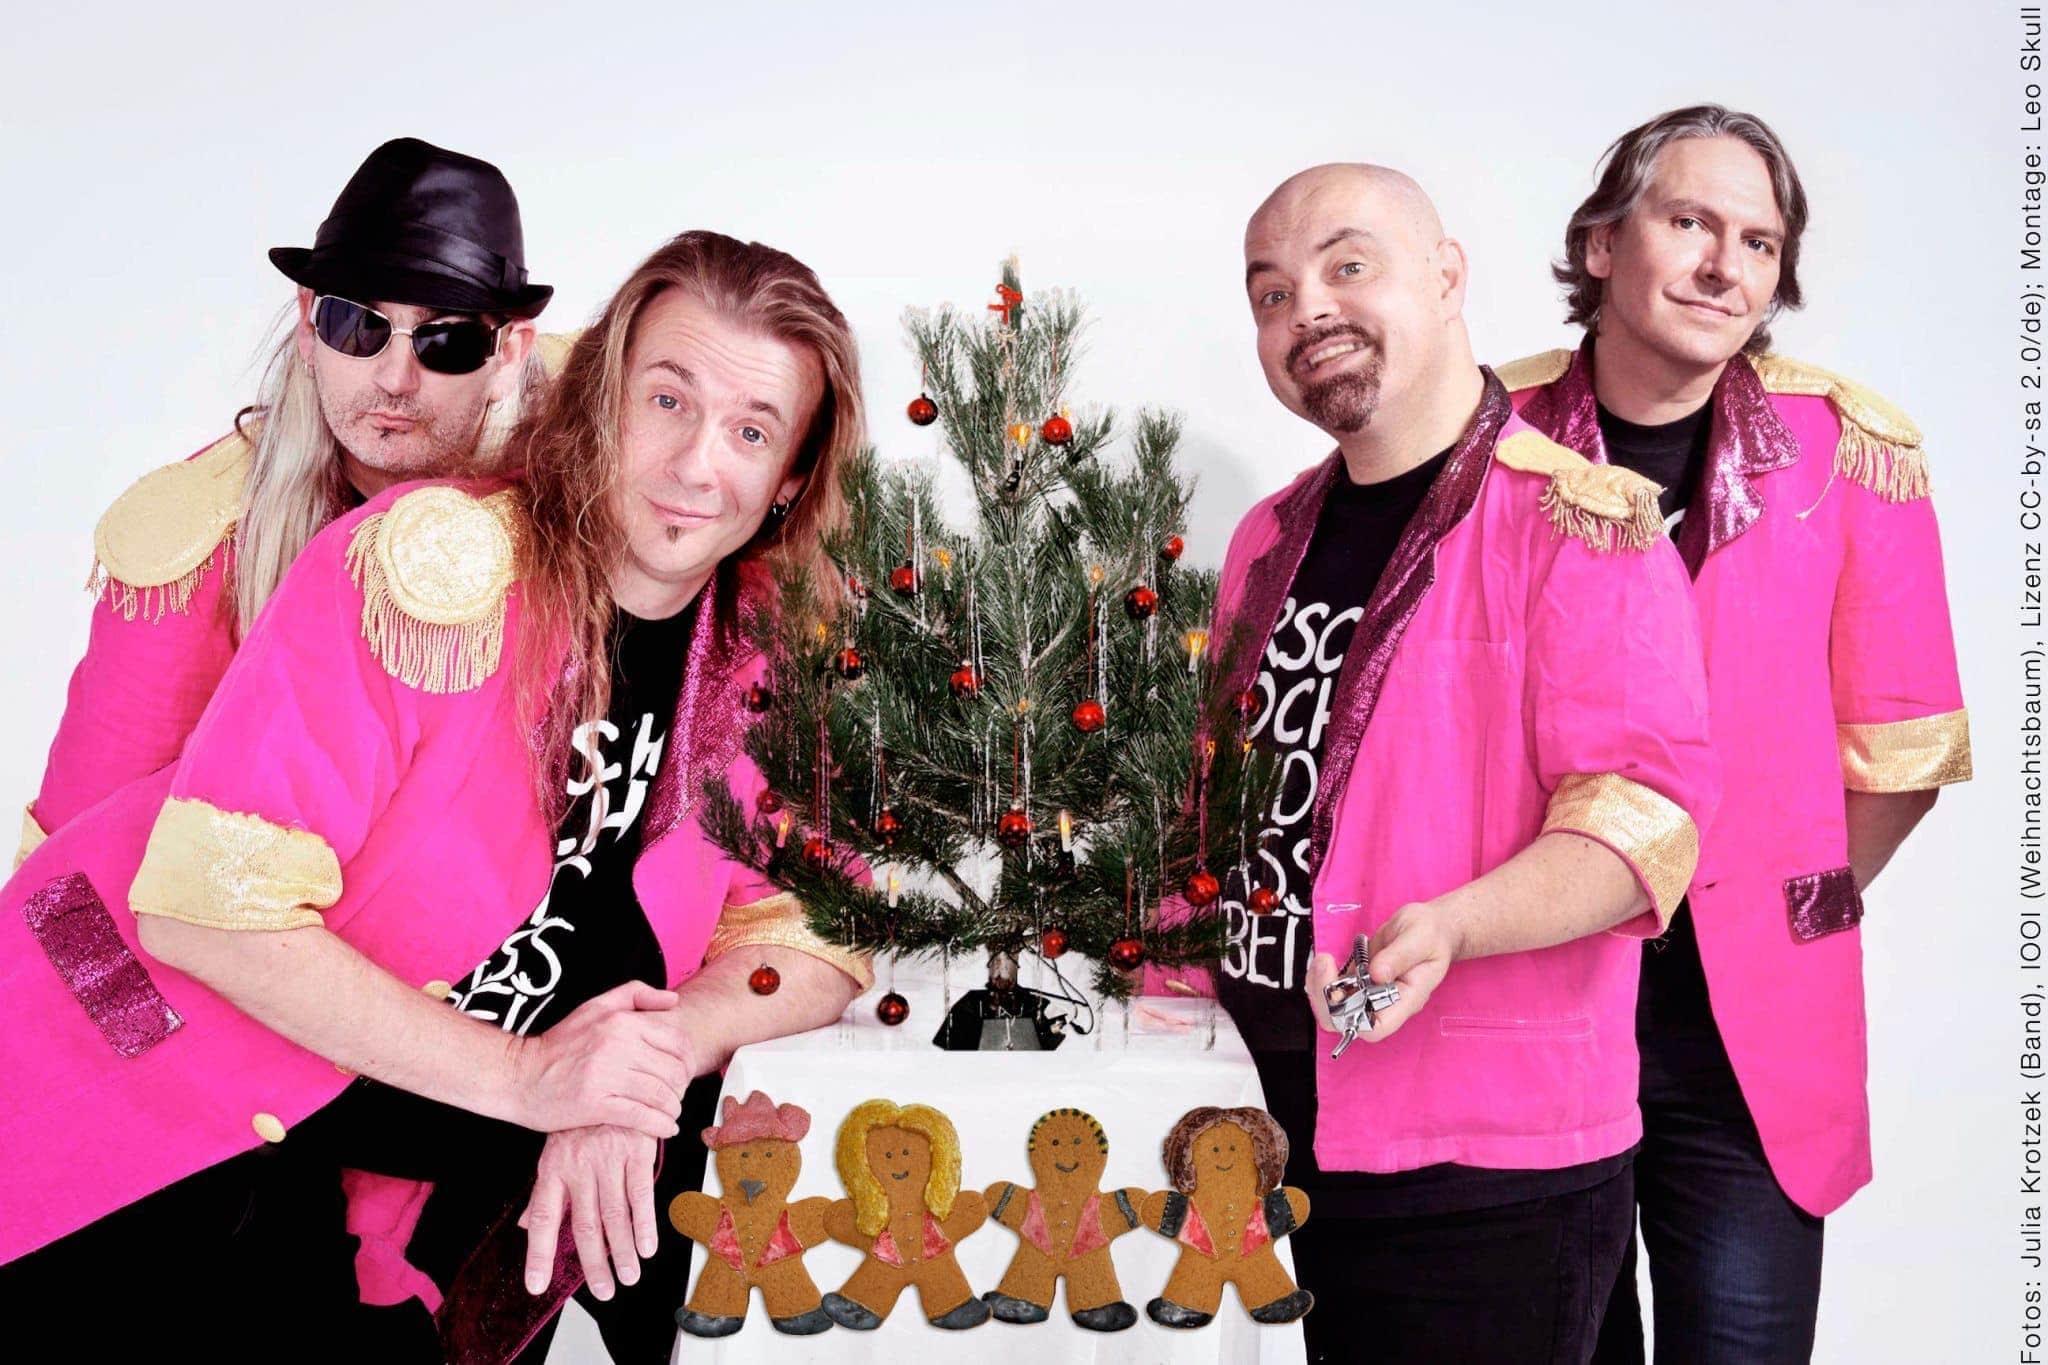 Wir wünschen BLAST Christmas!